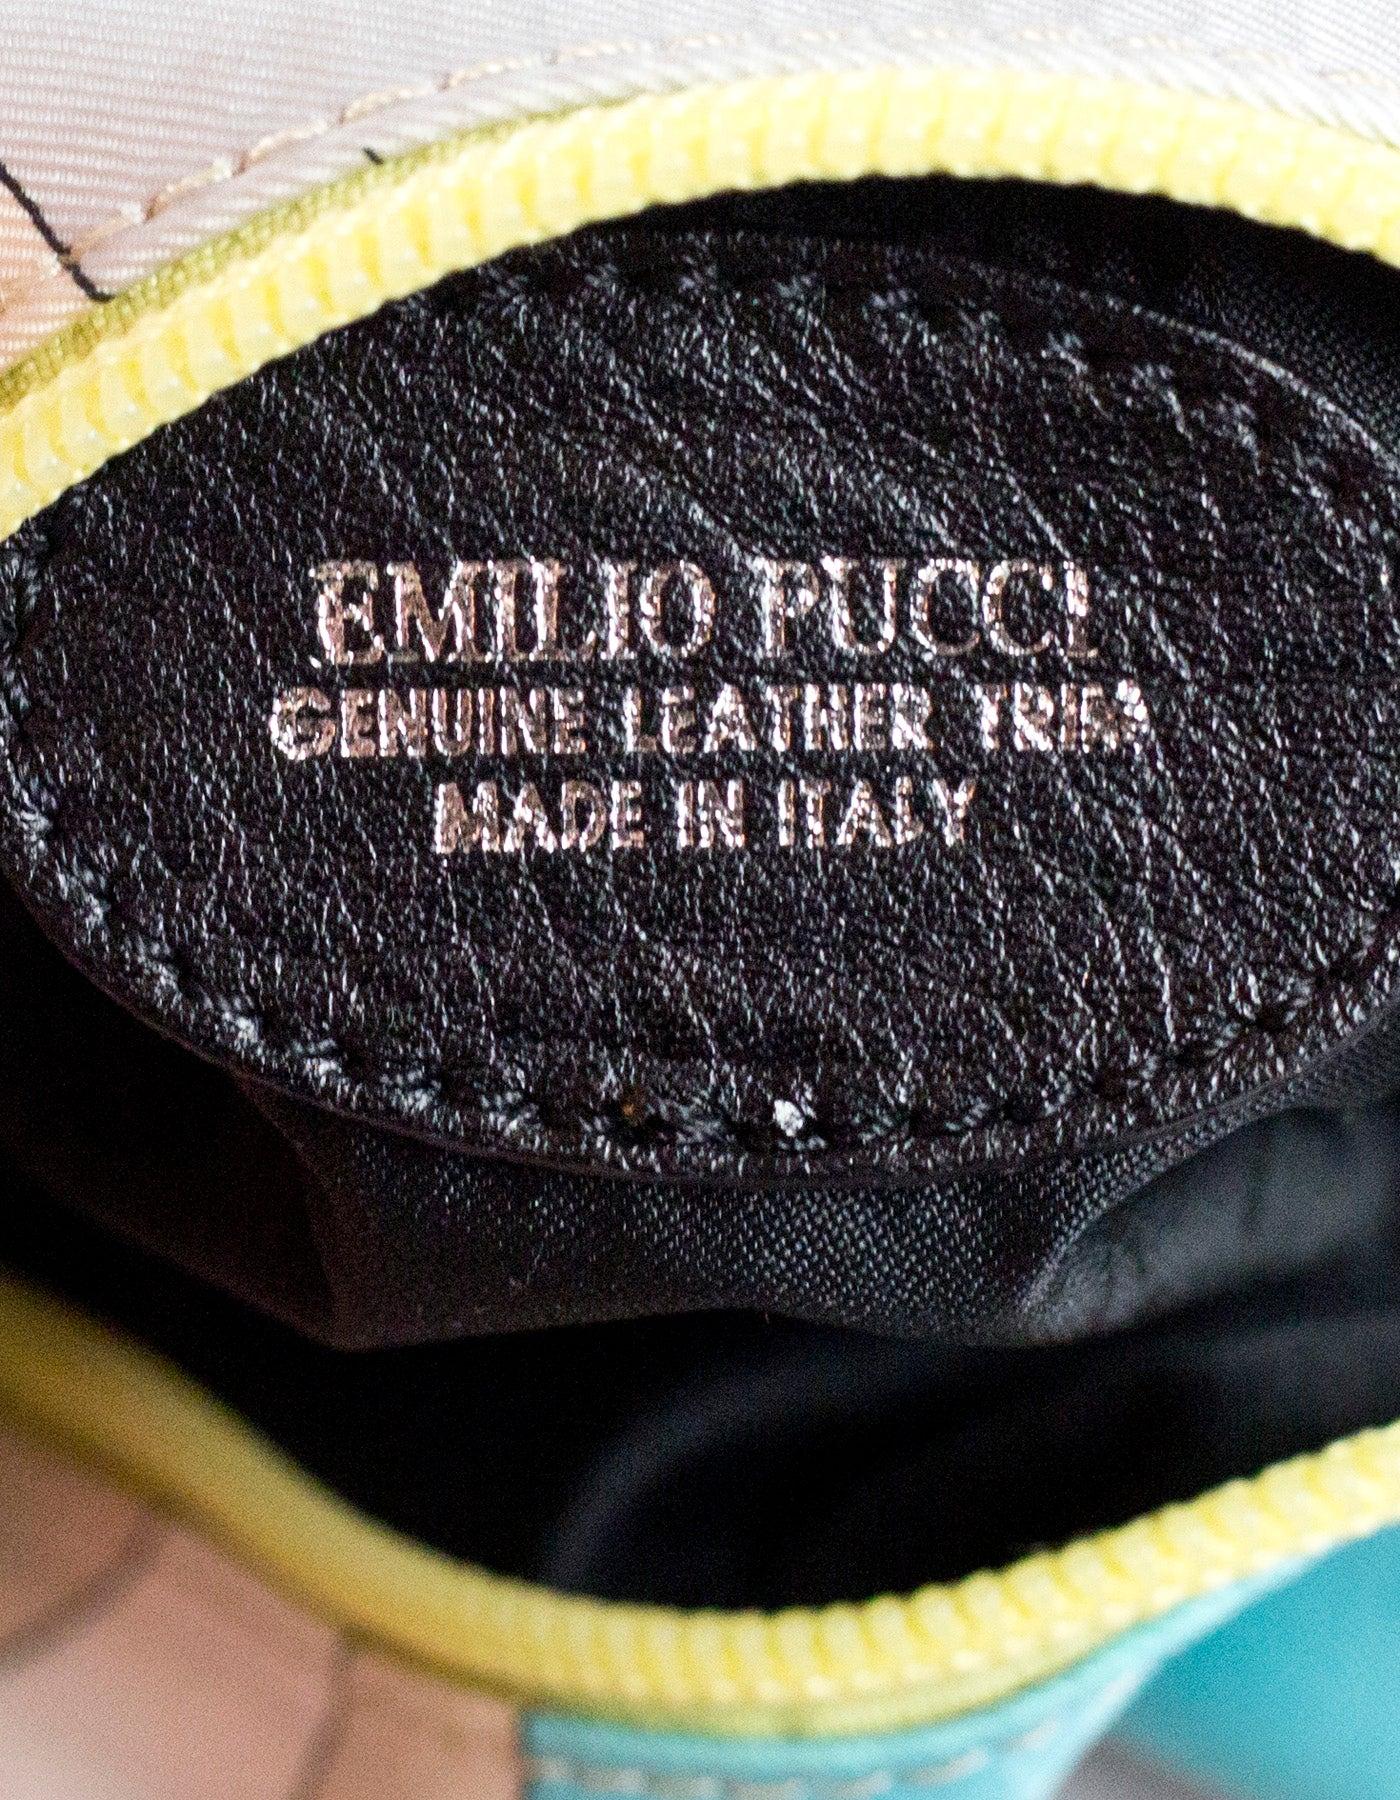 Emilio Pucci Multi-Color Print Cosmetic Bag